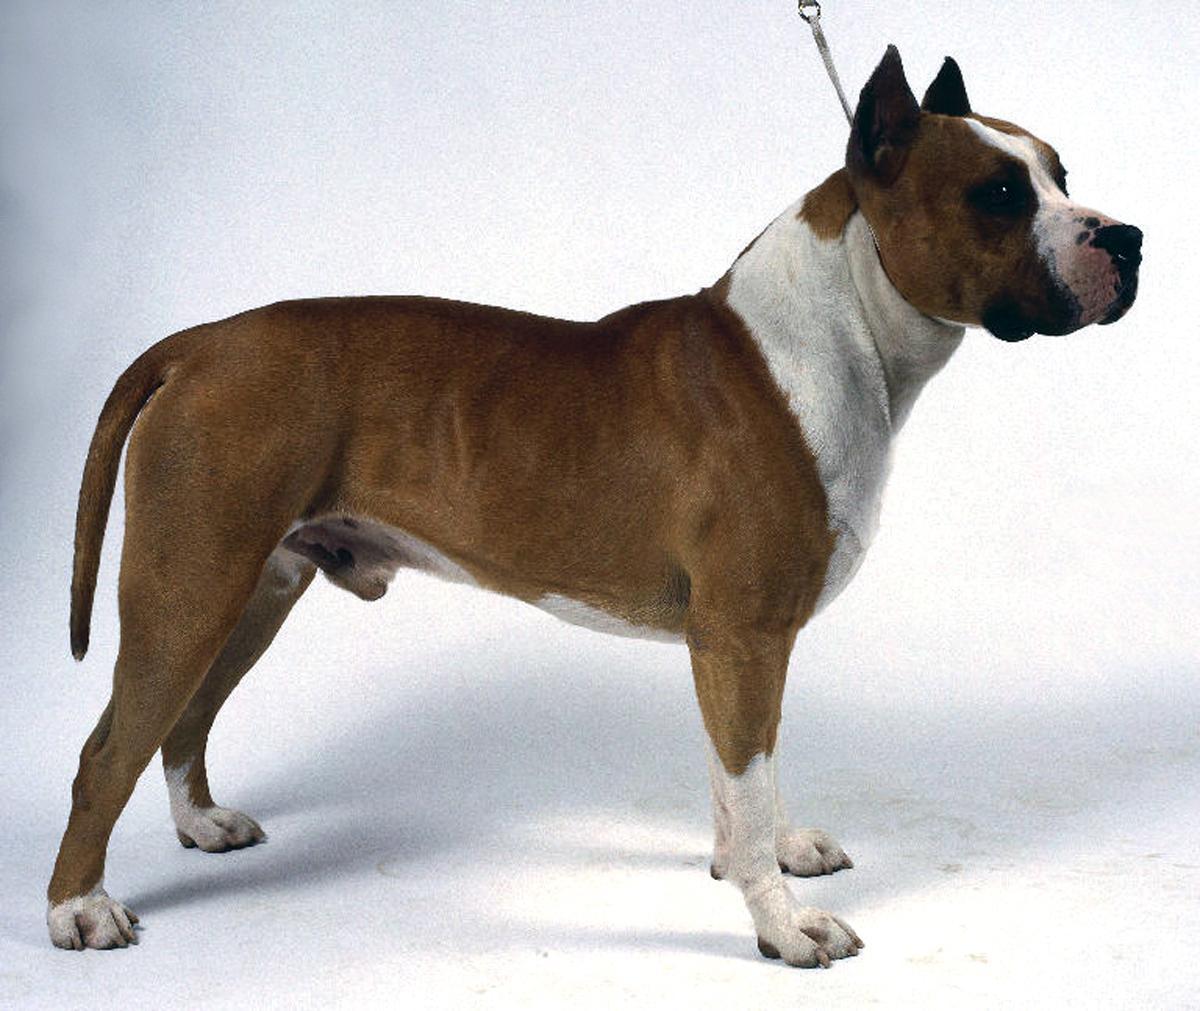 Bull and Terrier Dog: Bull Bull And Terrier Dog In Rack Breed